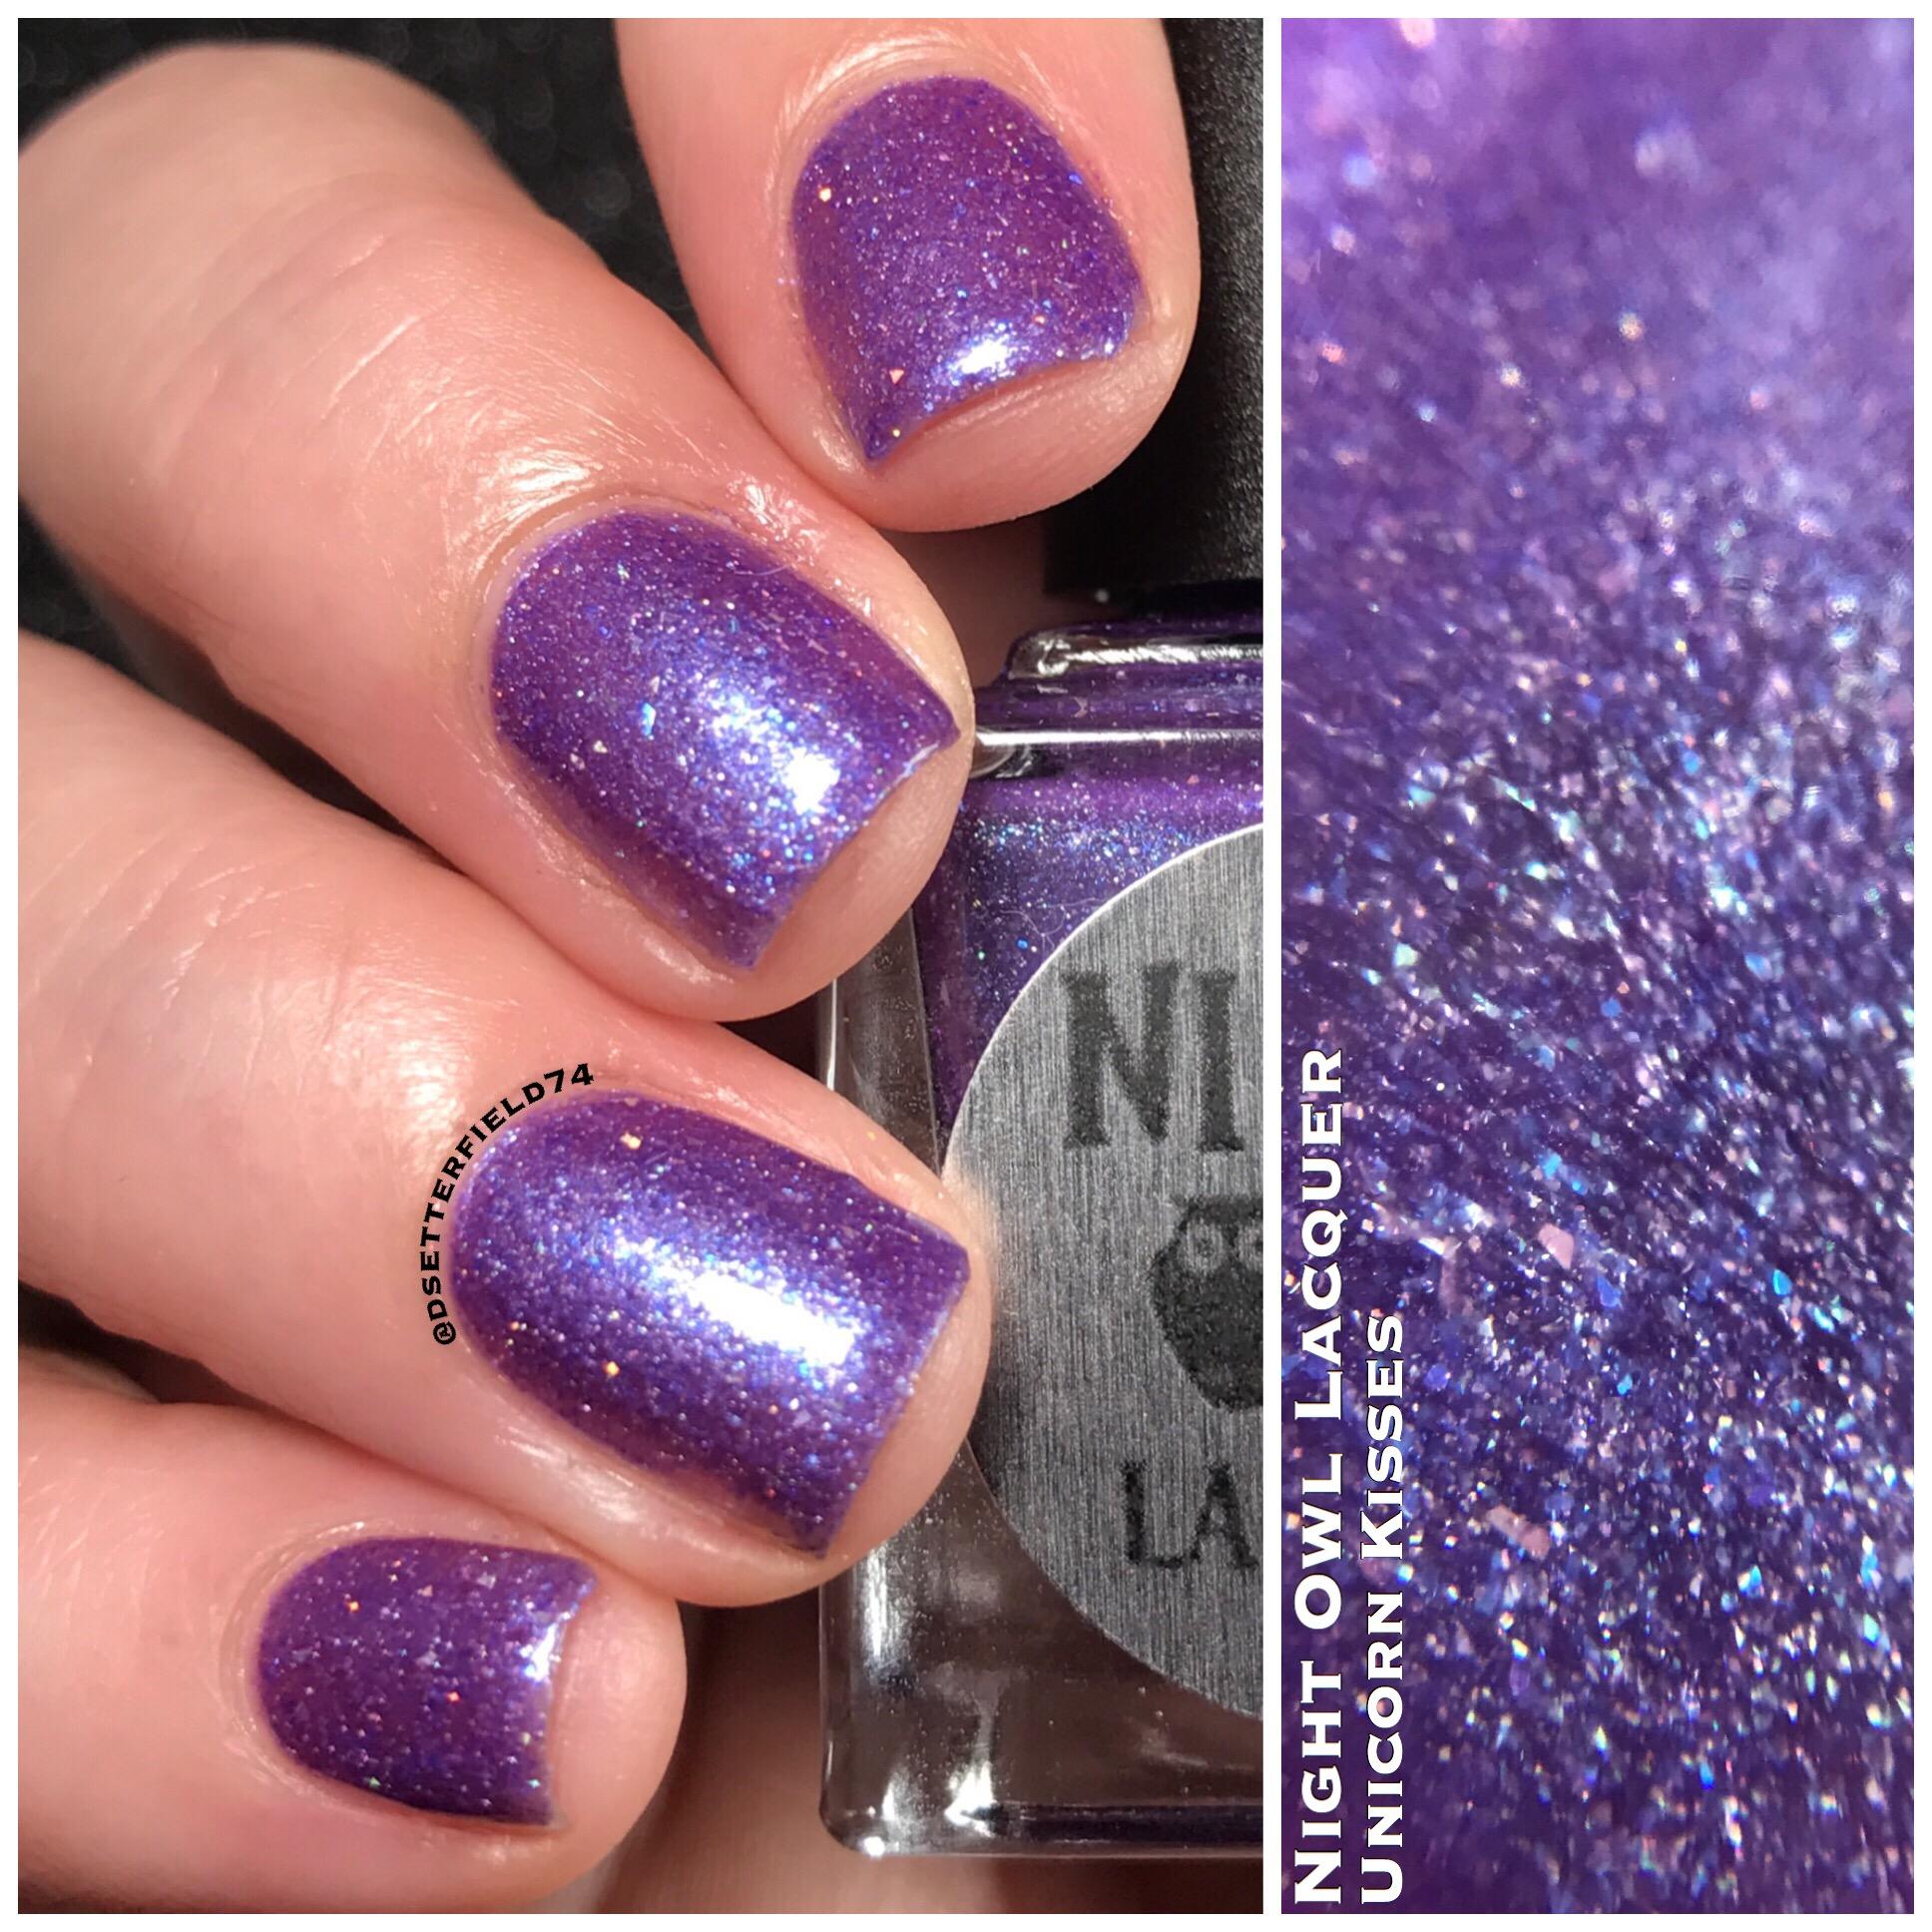 inspurrrations nail polish | Snacks On Rotation